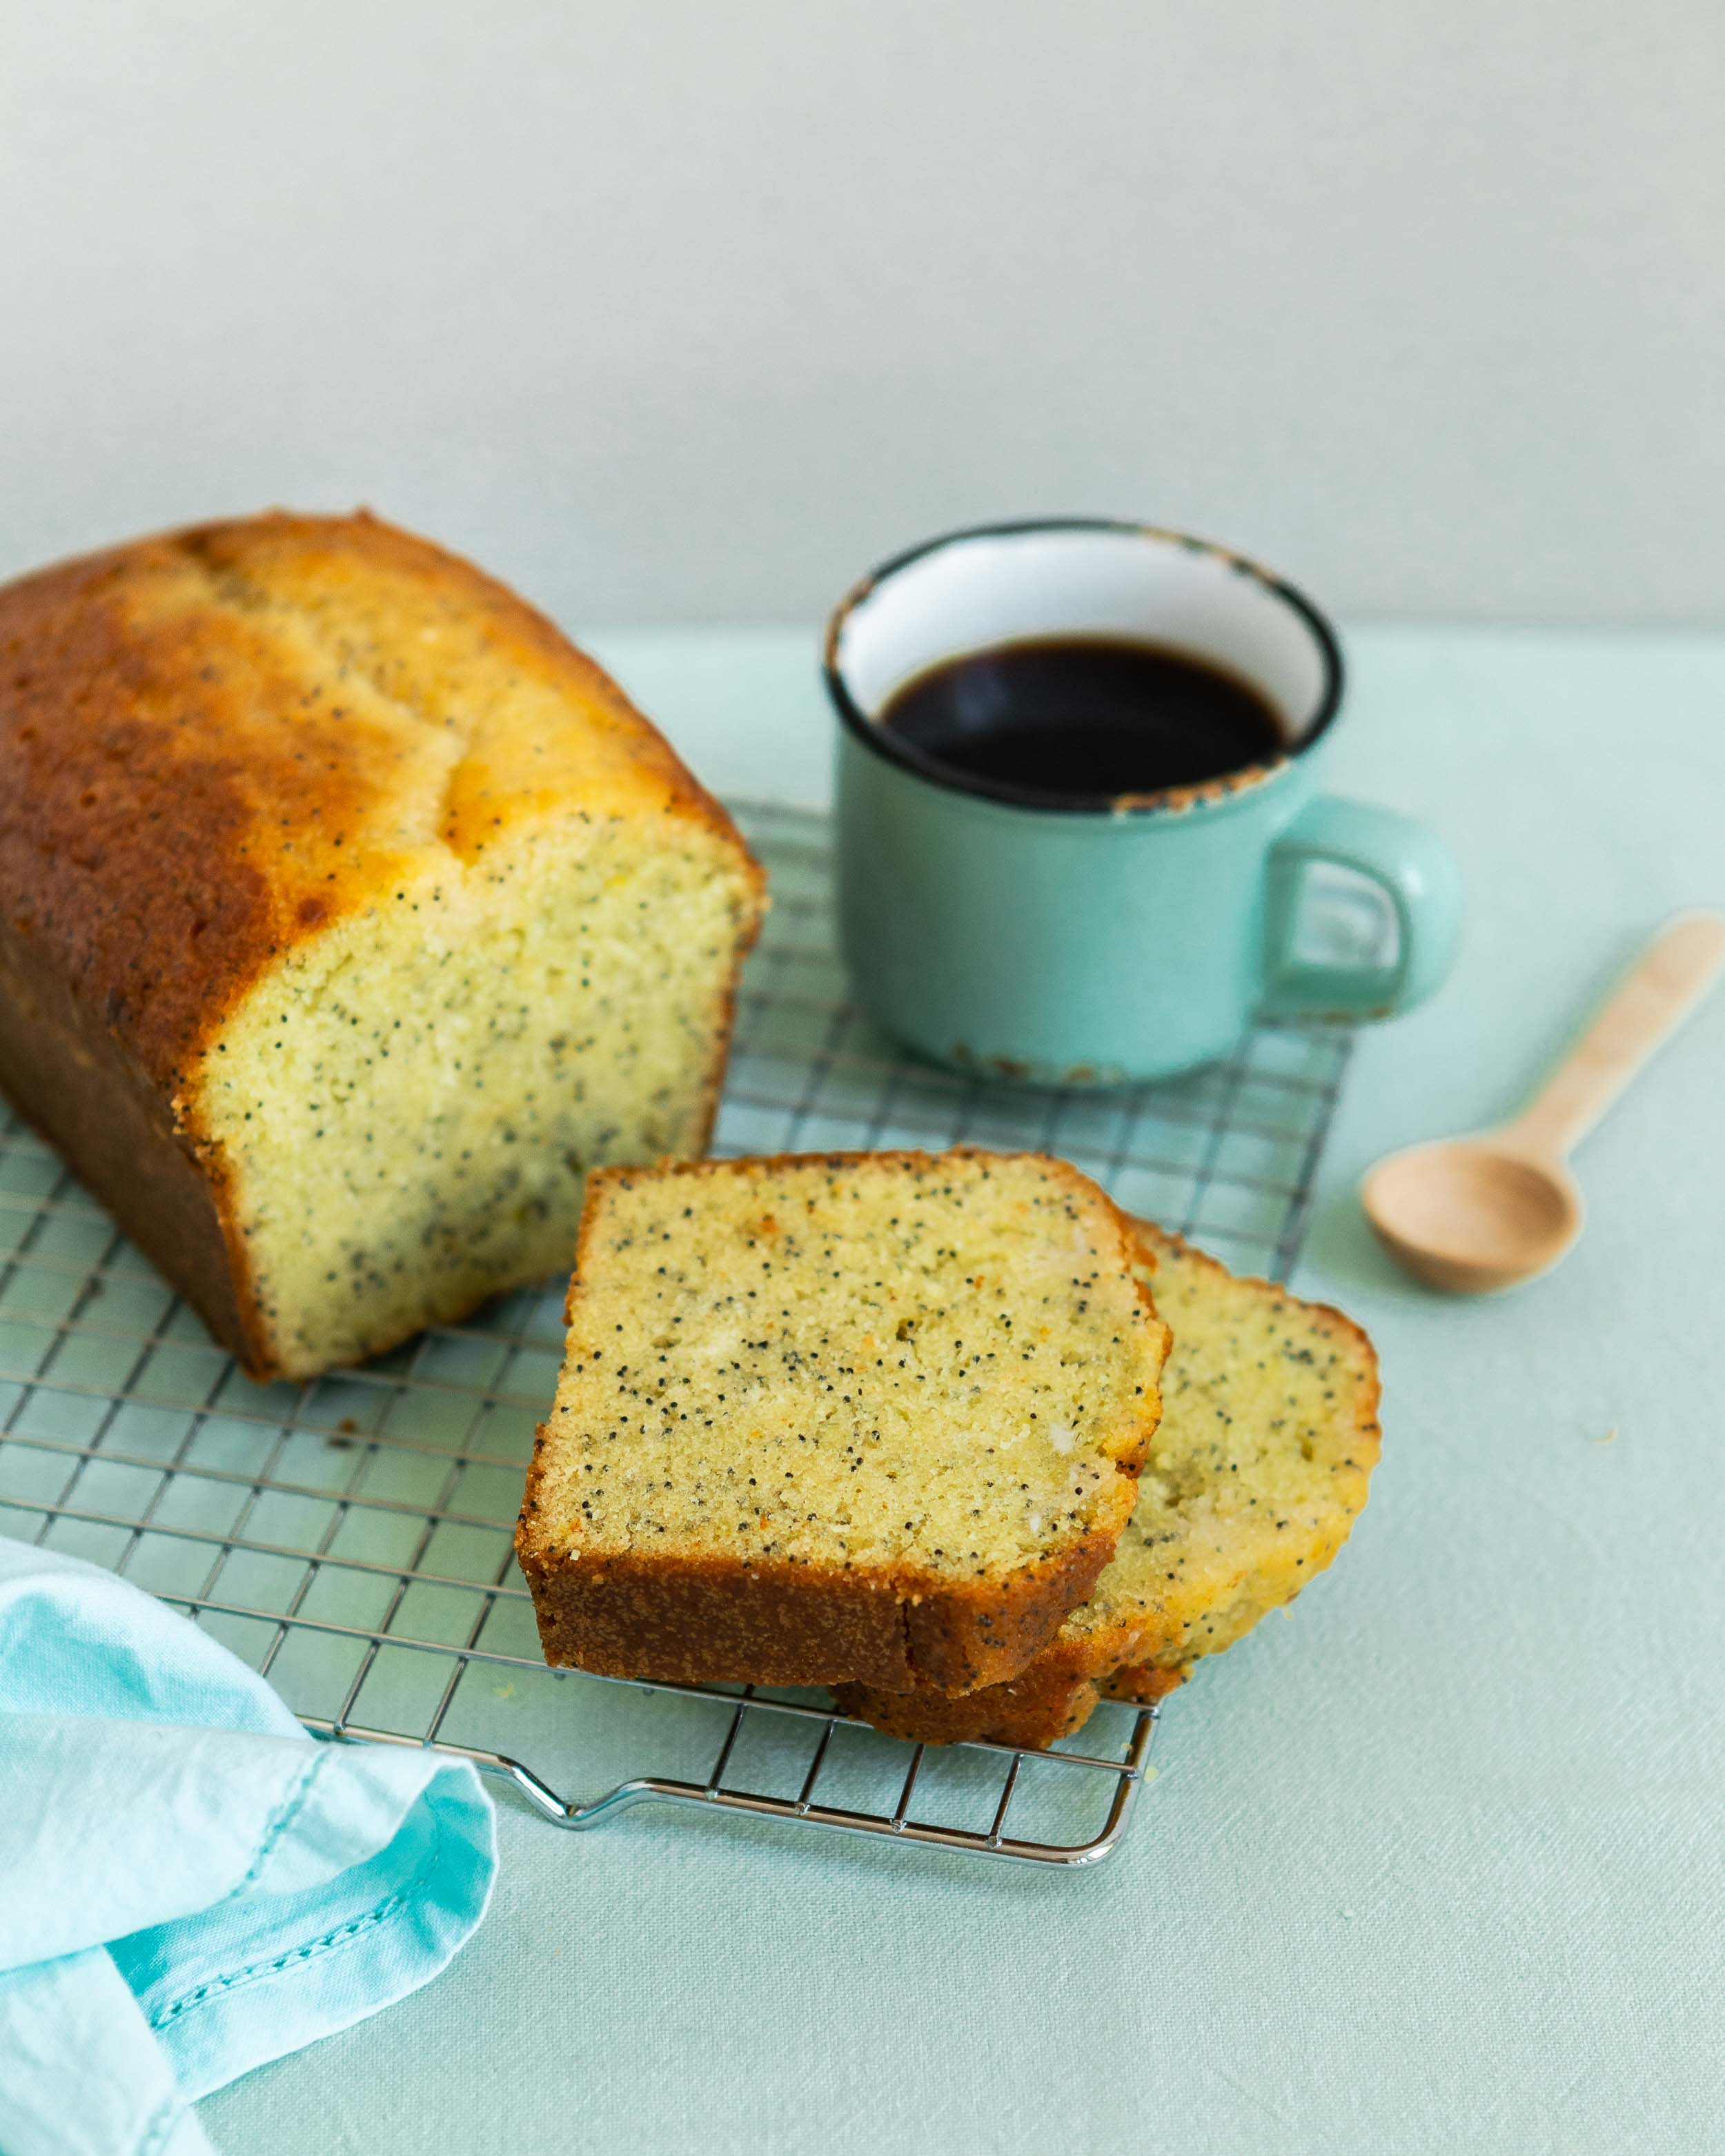 brittons bakery | verdenius | 143A0317.jpg